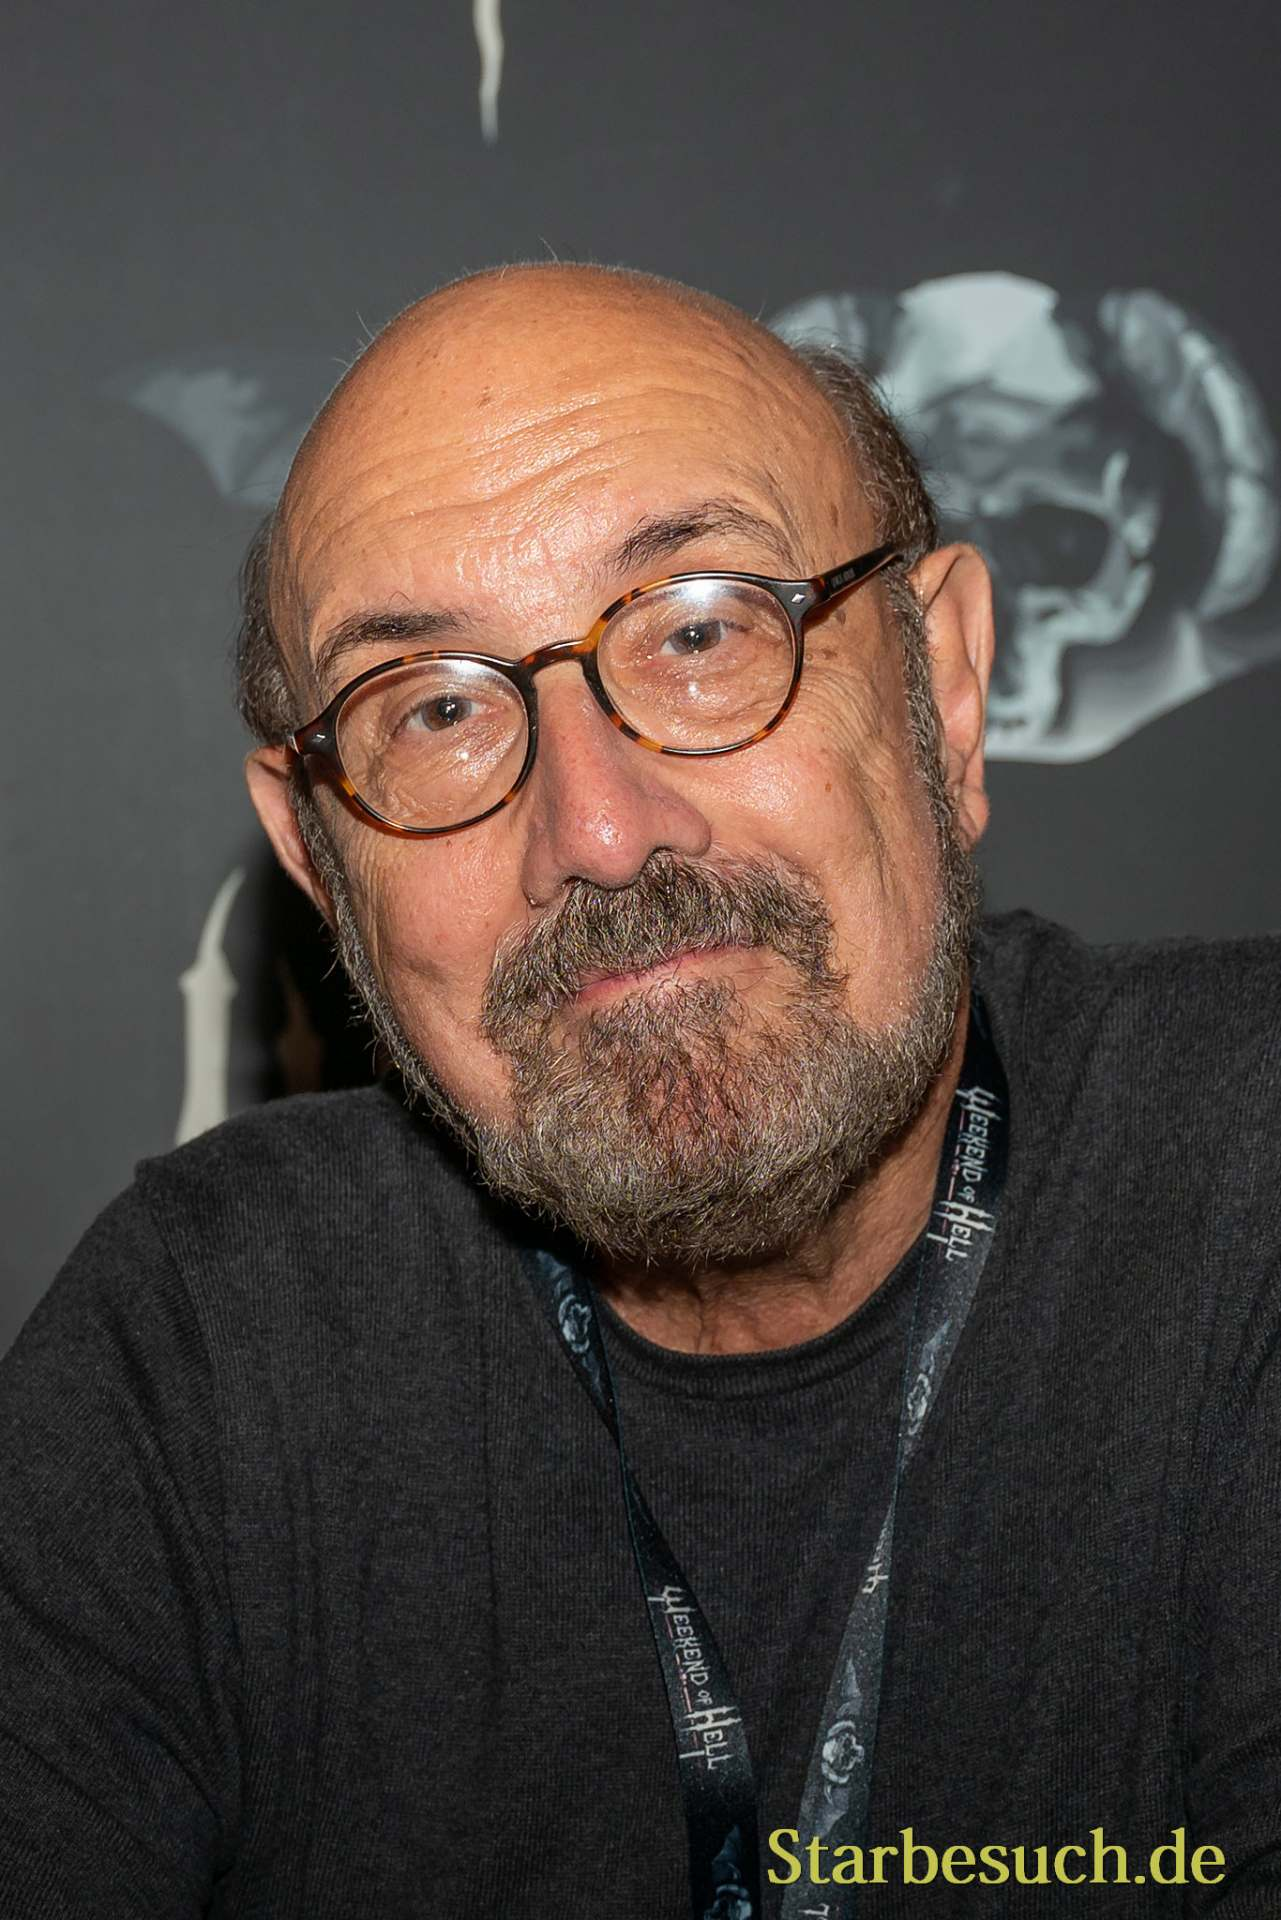 Harry Manfredini